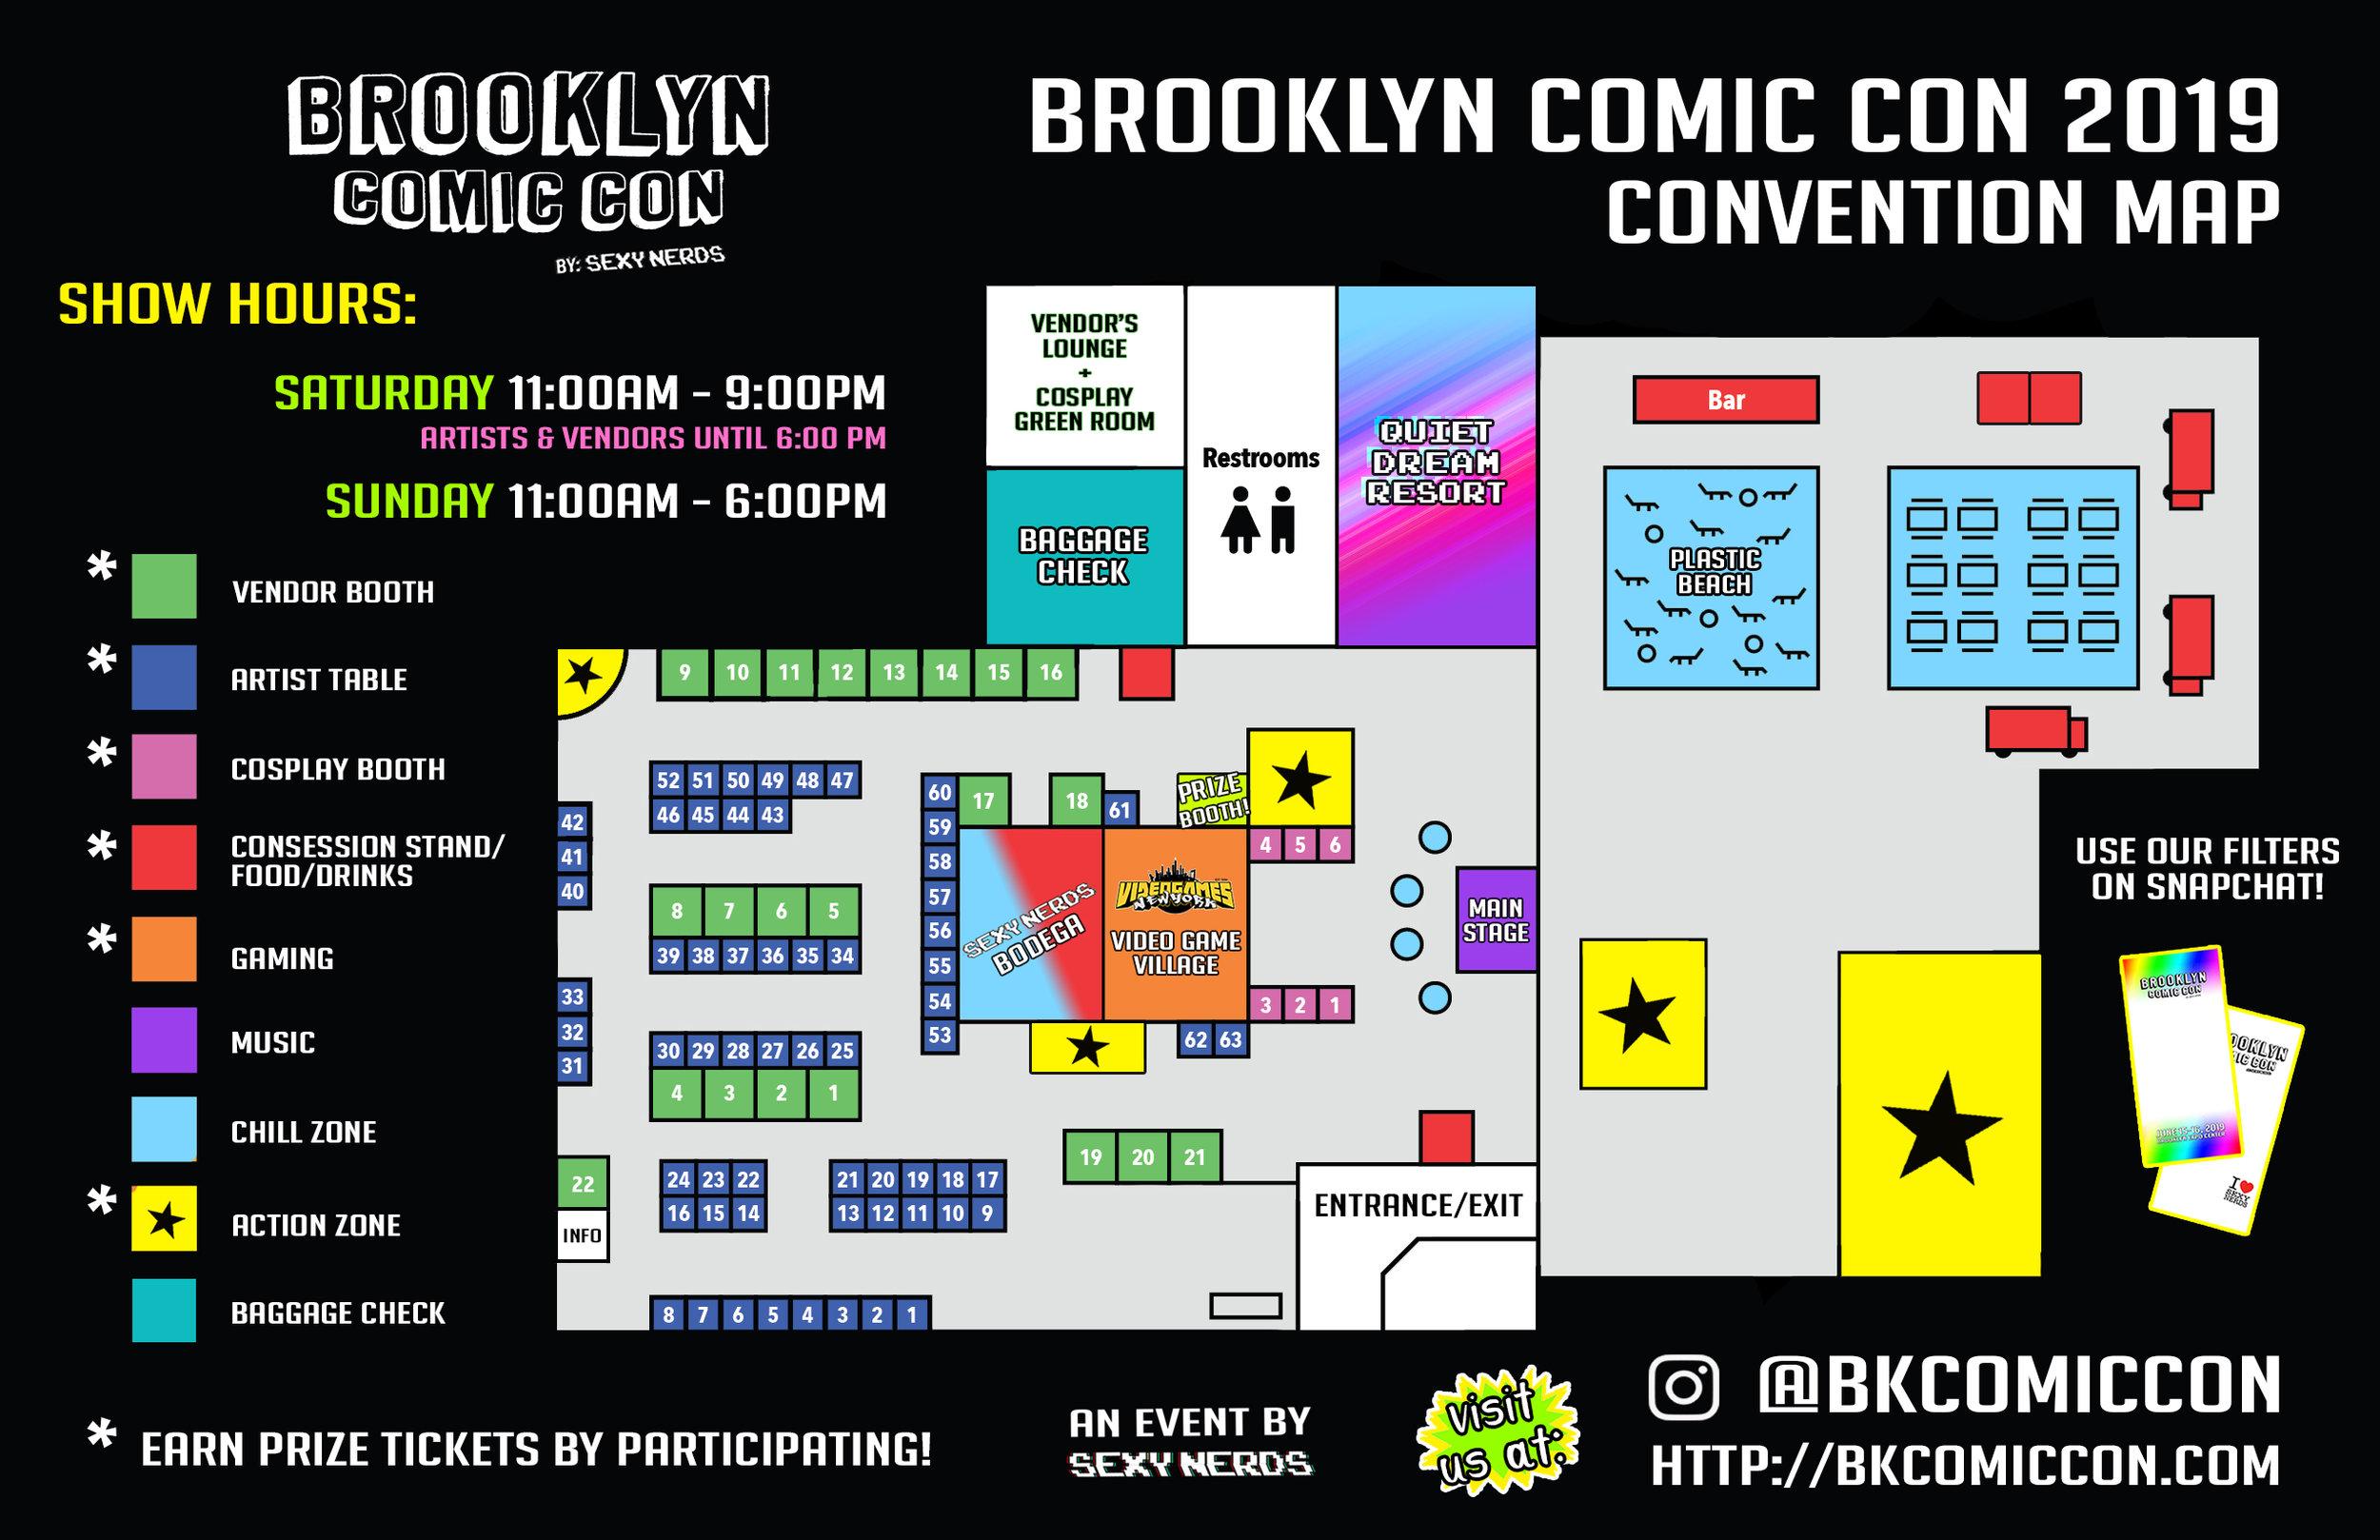 bkcomiccon final floorplan 5.jpg